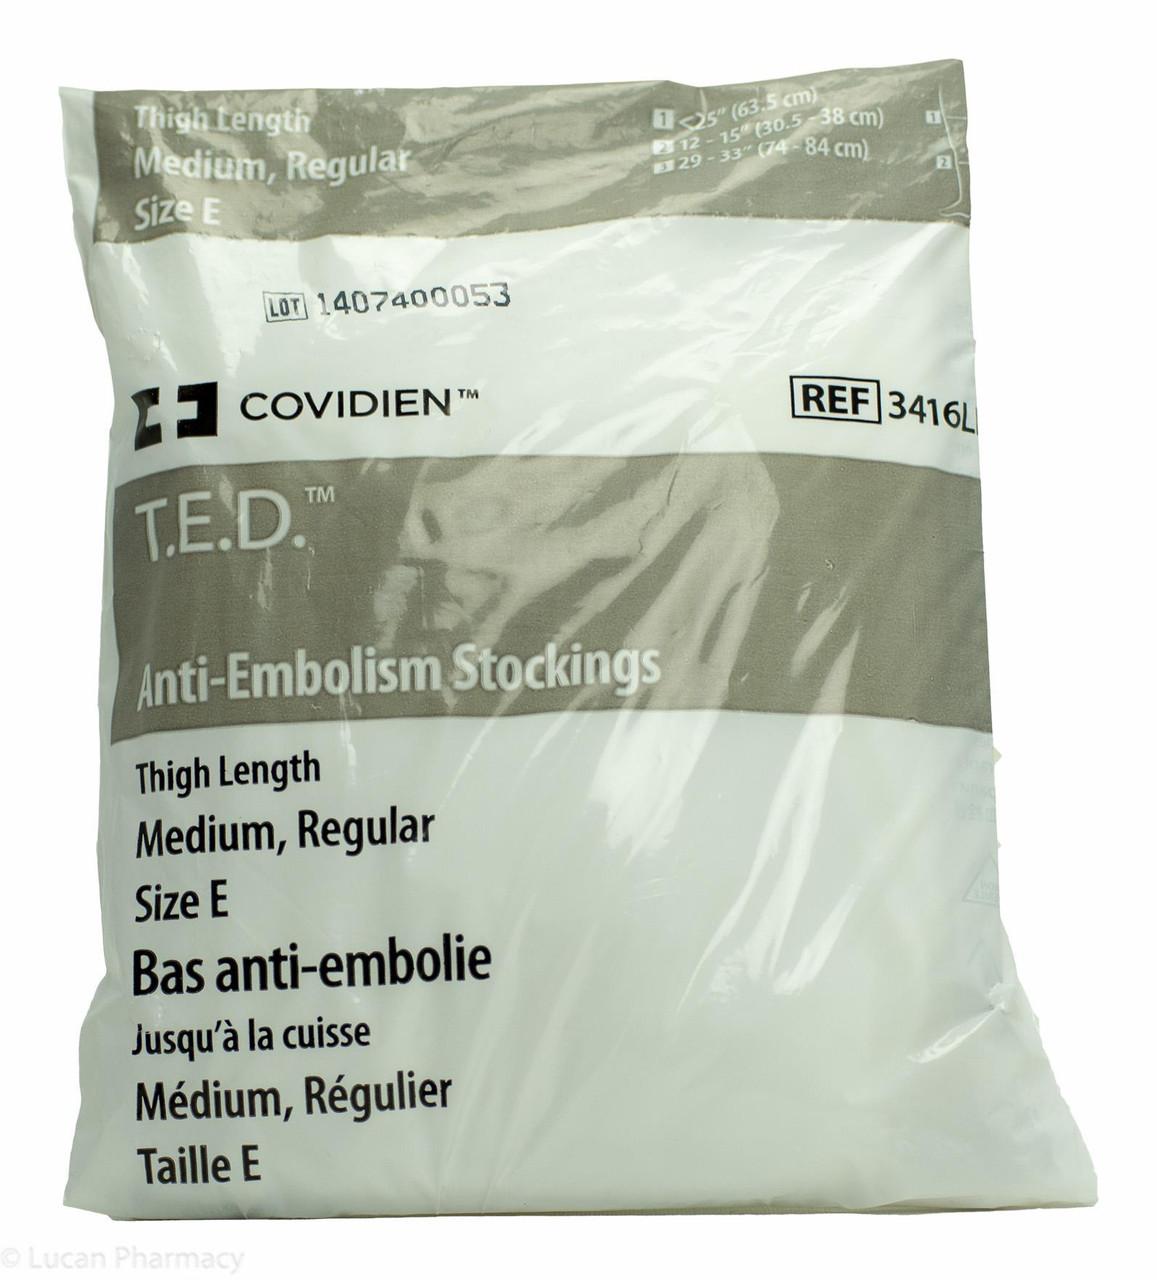 fe5bbdd91a T.E.D.® Anti-Embolism Stockings TED - Thigh Length Medium Regular (Size E)